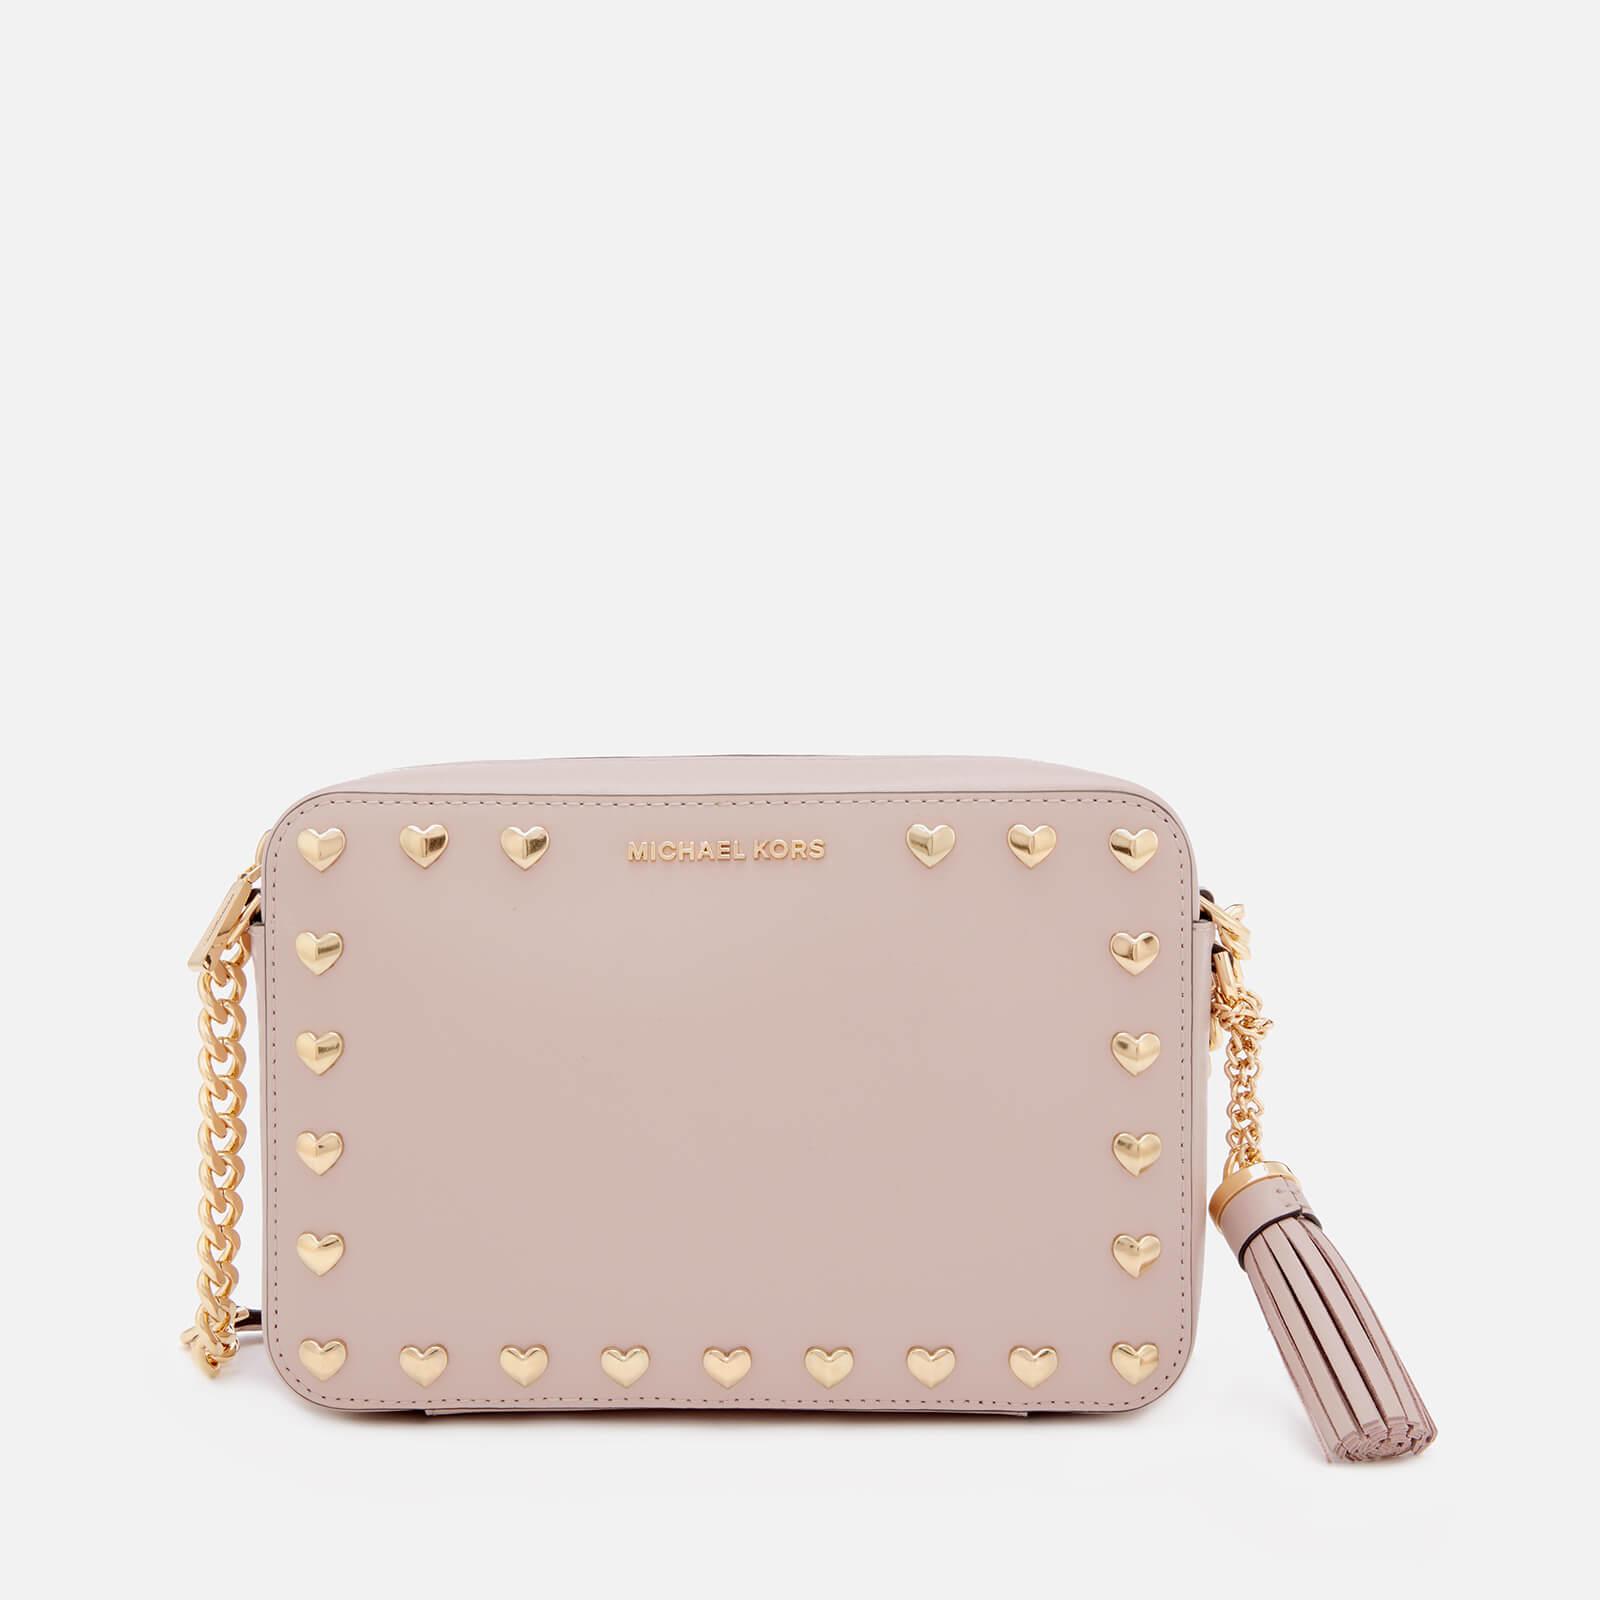 0f6f3b561ea7 MICHAEL MICHAEL KORS Women's Ginny Medium Camera Bag - Soft Pink - Free UK  Delivery over £50